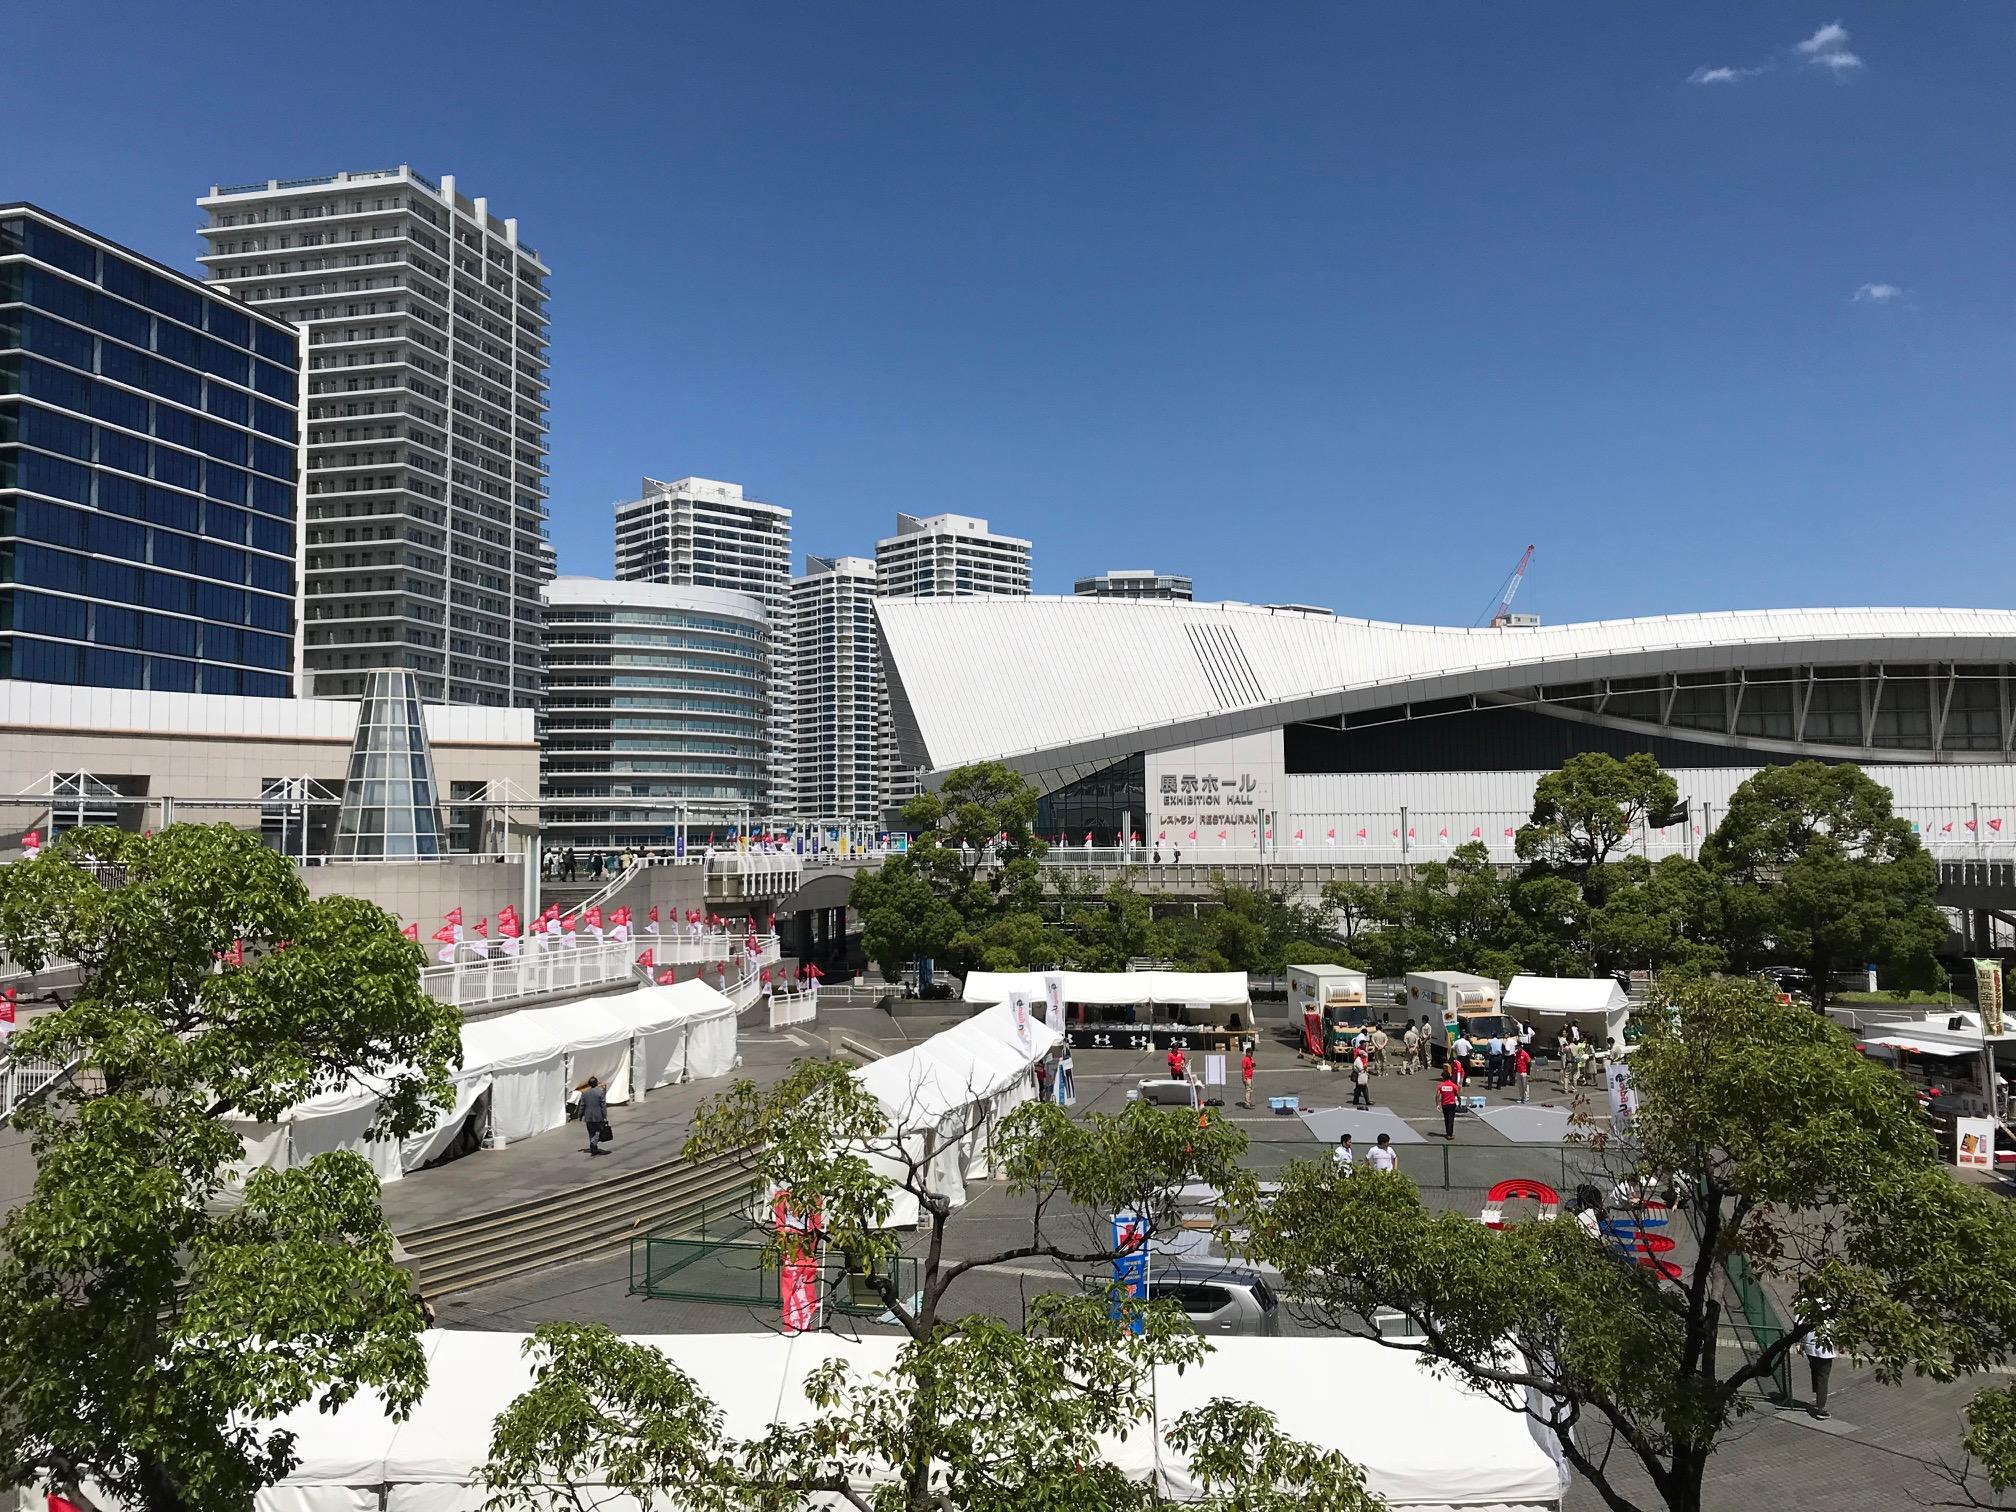 Pacifico Yokohama Exhibition Hall